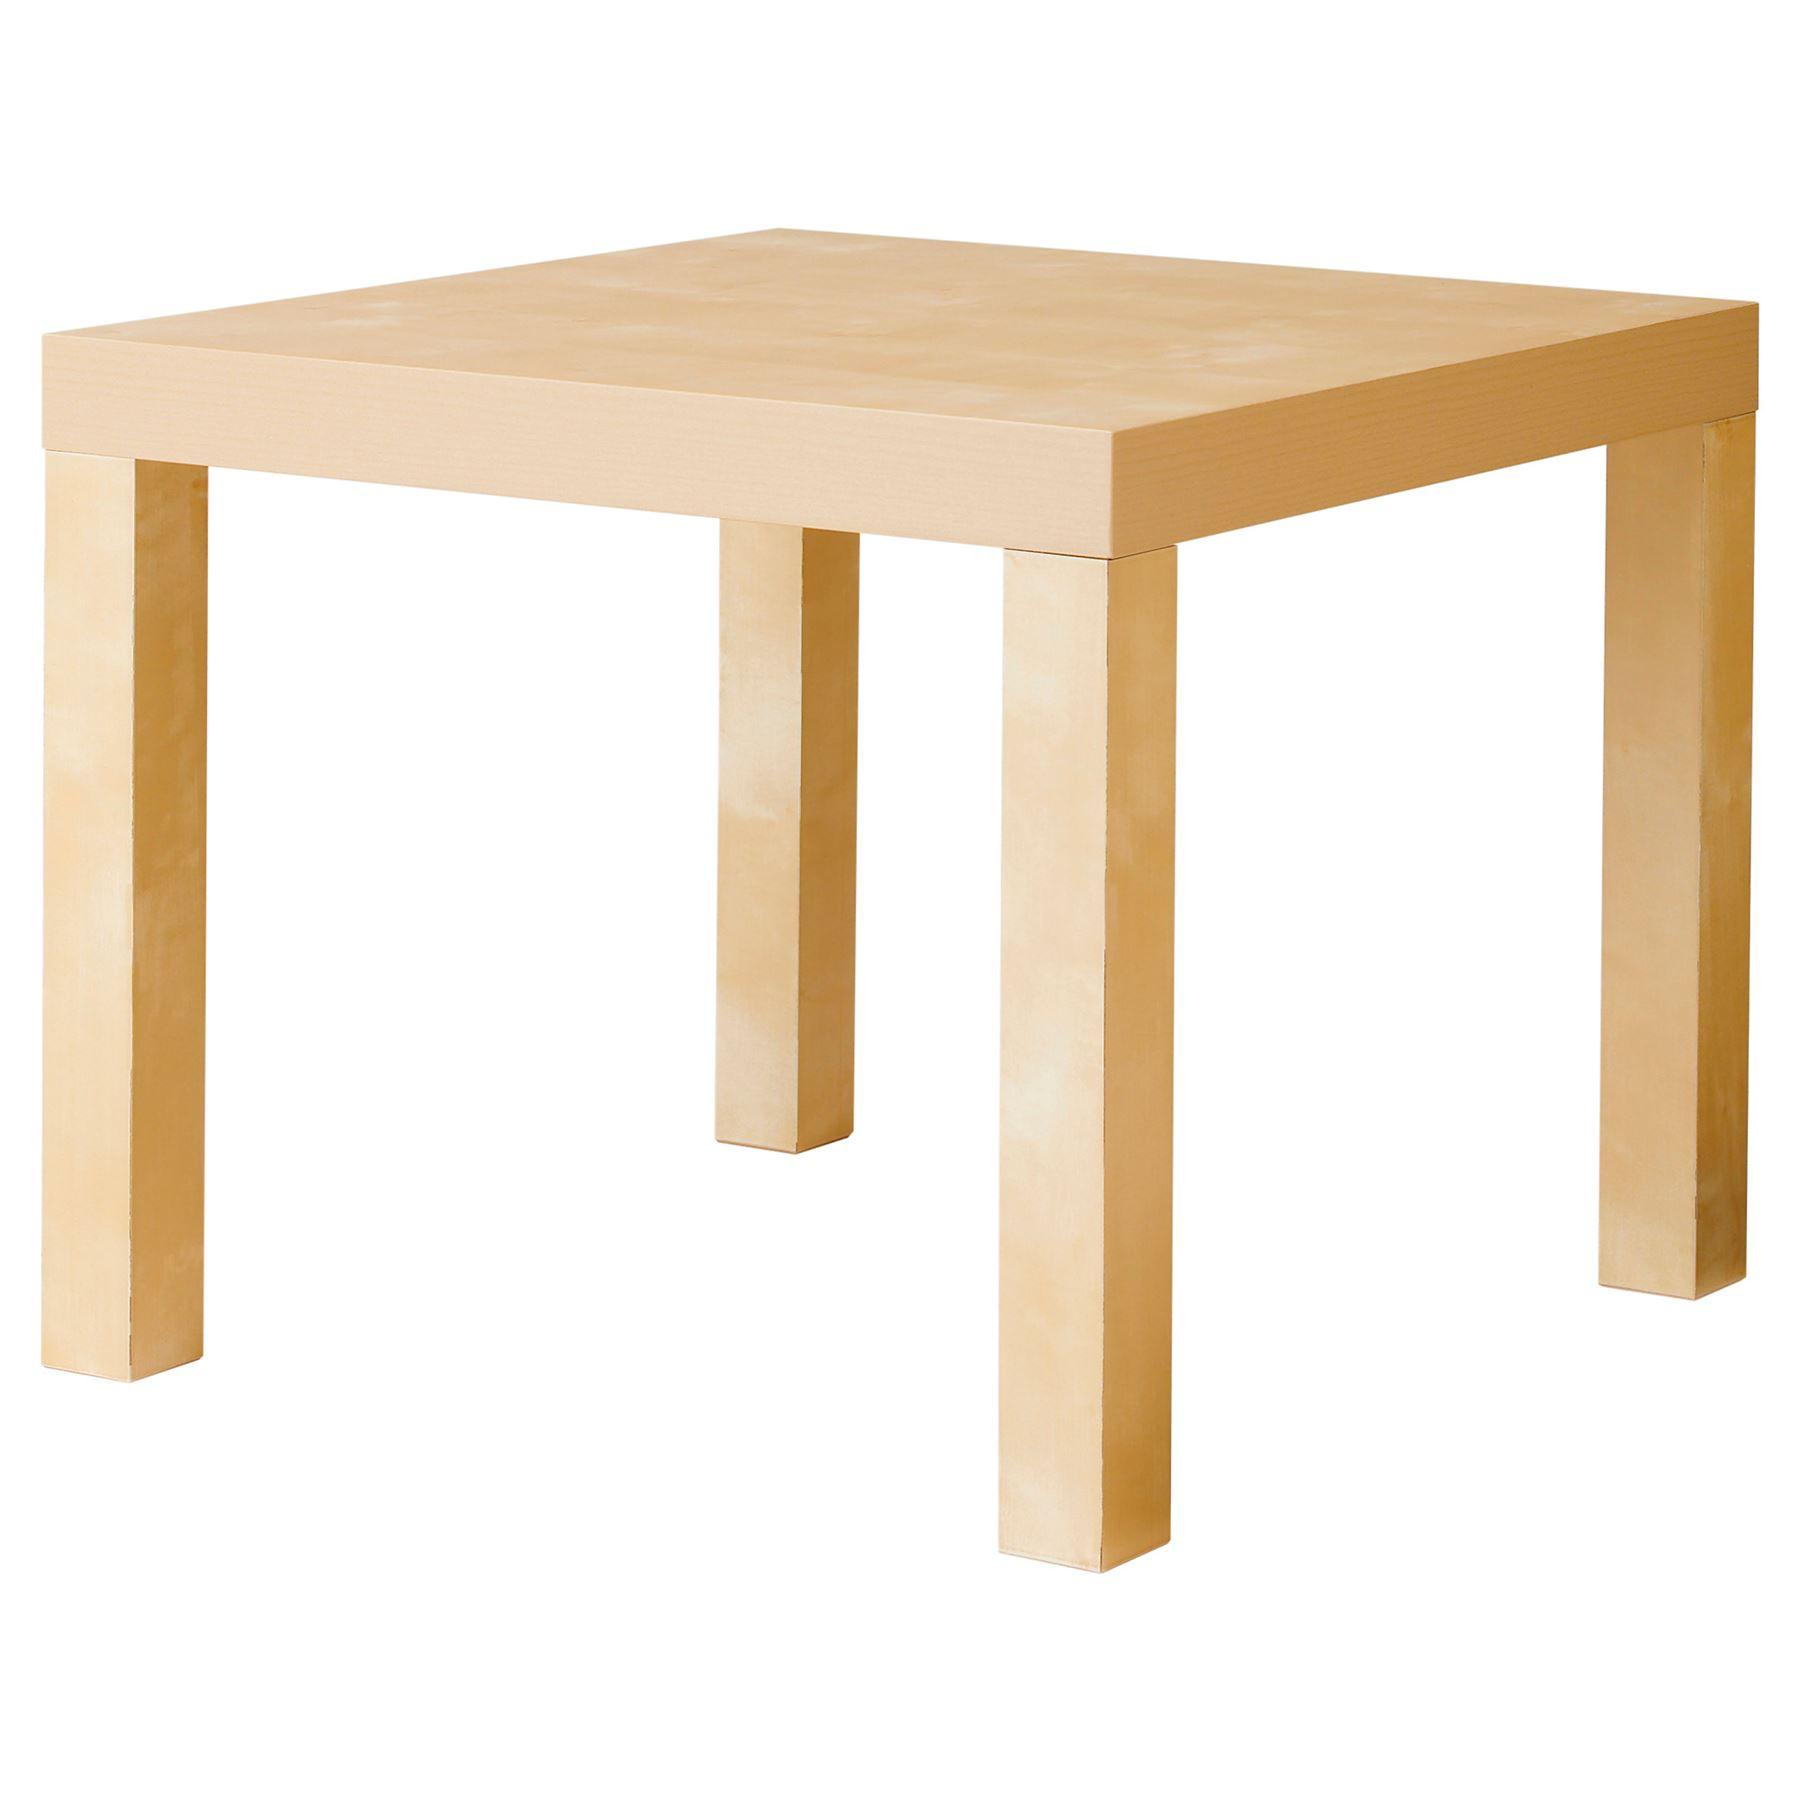 Ikea Trending Style Elegant Designer Lack Side Table For Living Room Furniture Ebay